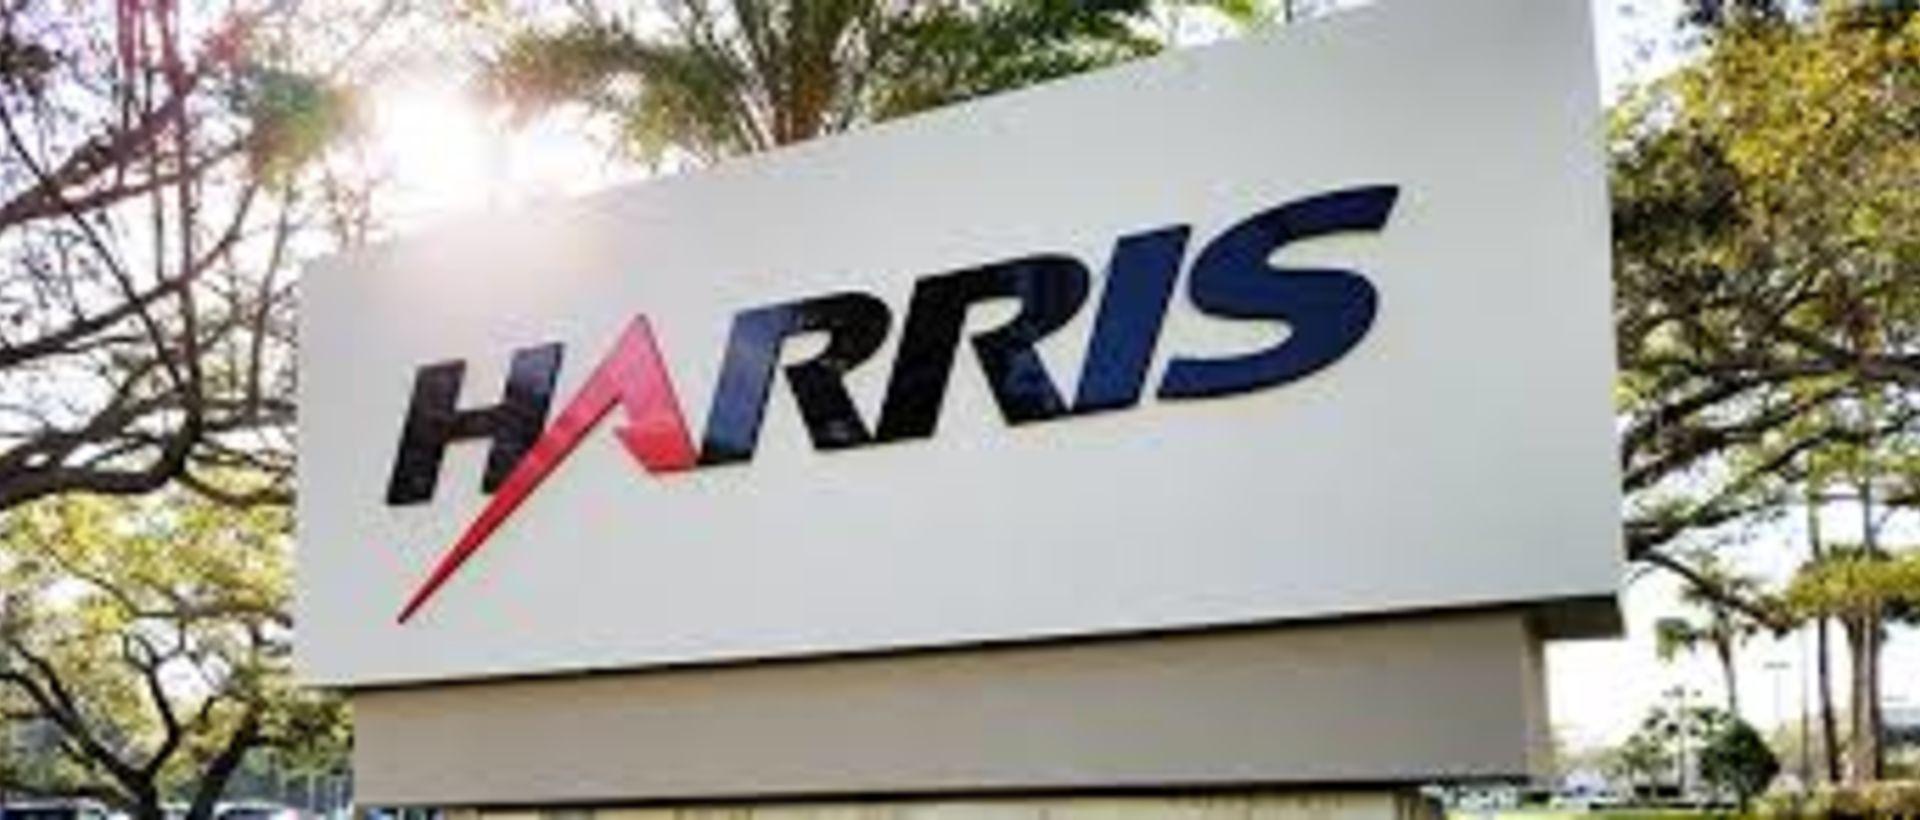 Shareholders overwhelmingly approve merger of high-tech giants Harris, L3 Technologies